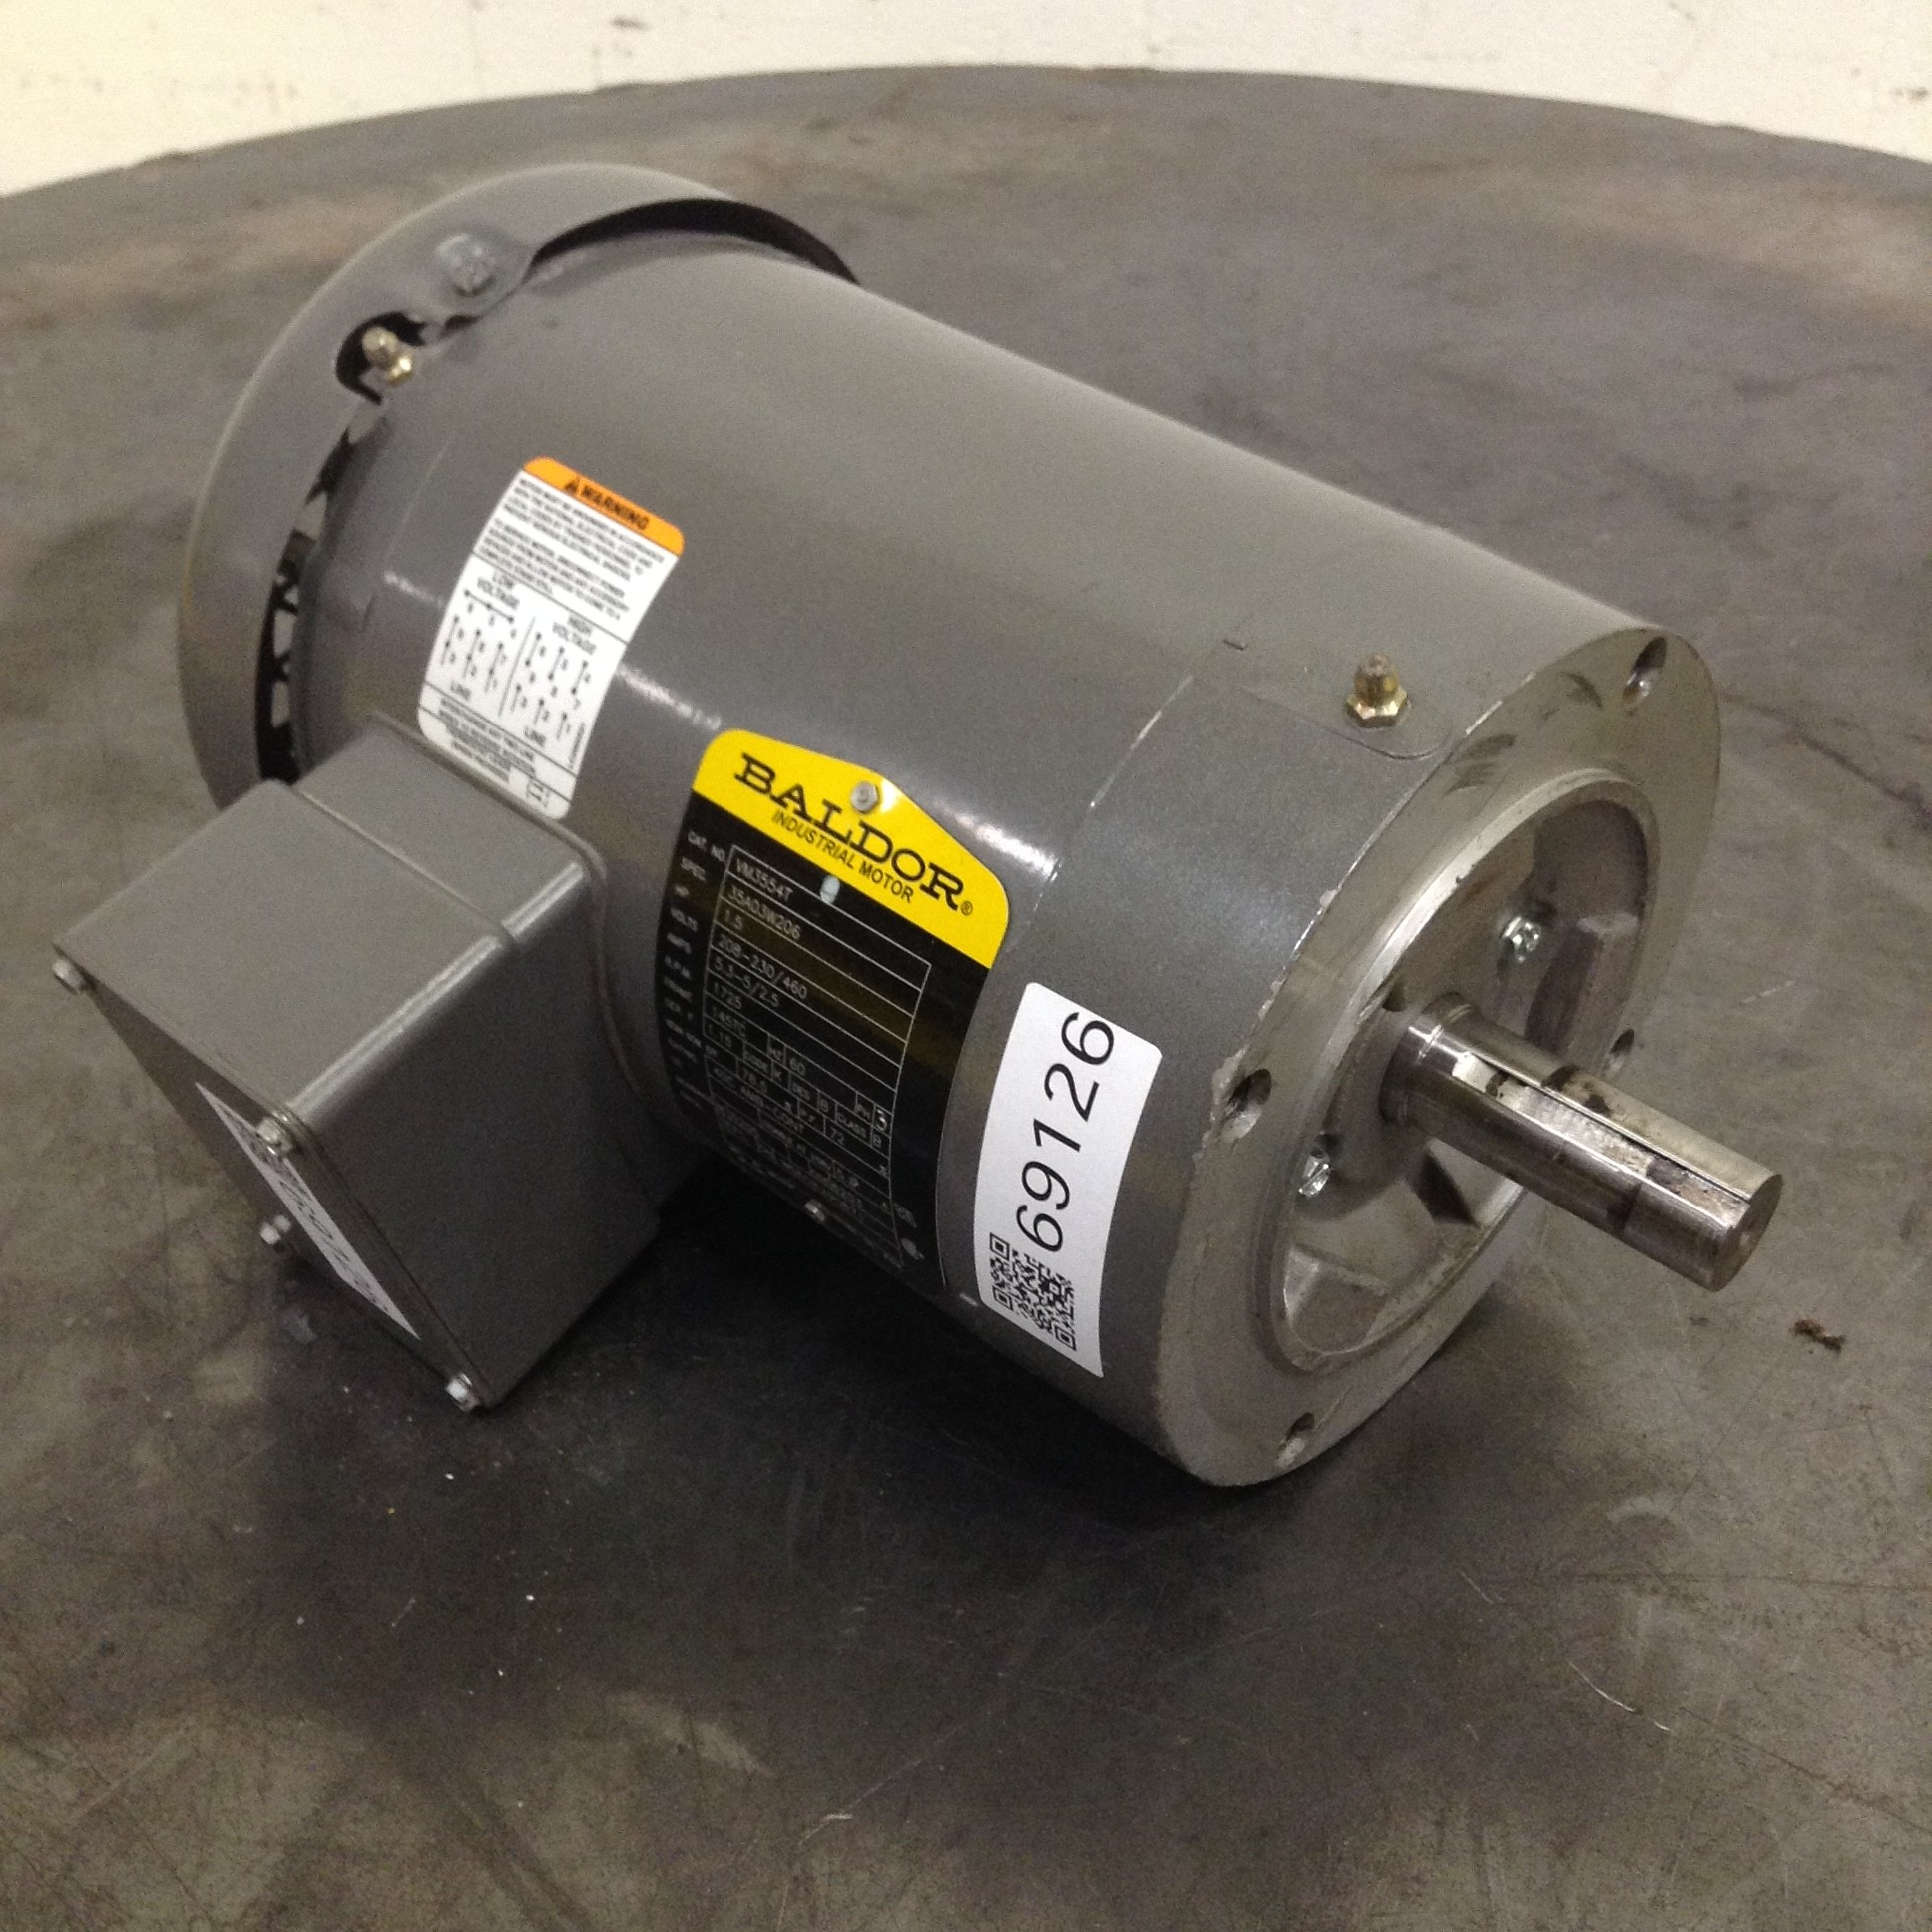 Baldor 1 5 hp electric motor vm3554t used 69126 ebay for 1 hp electric motor